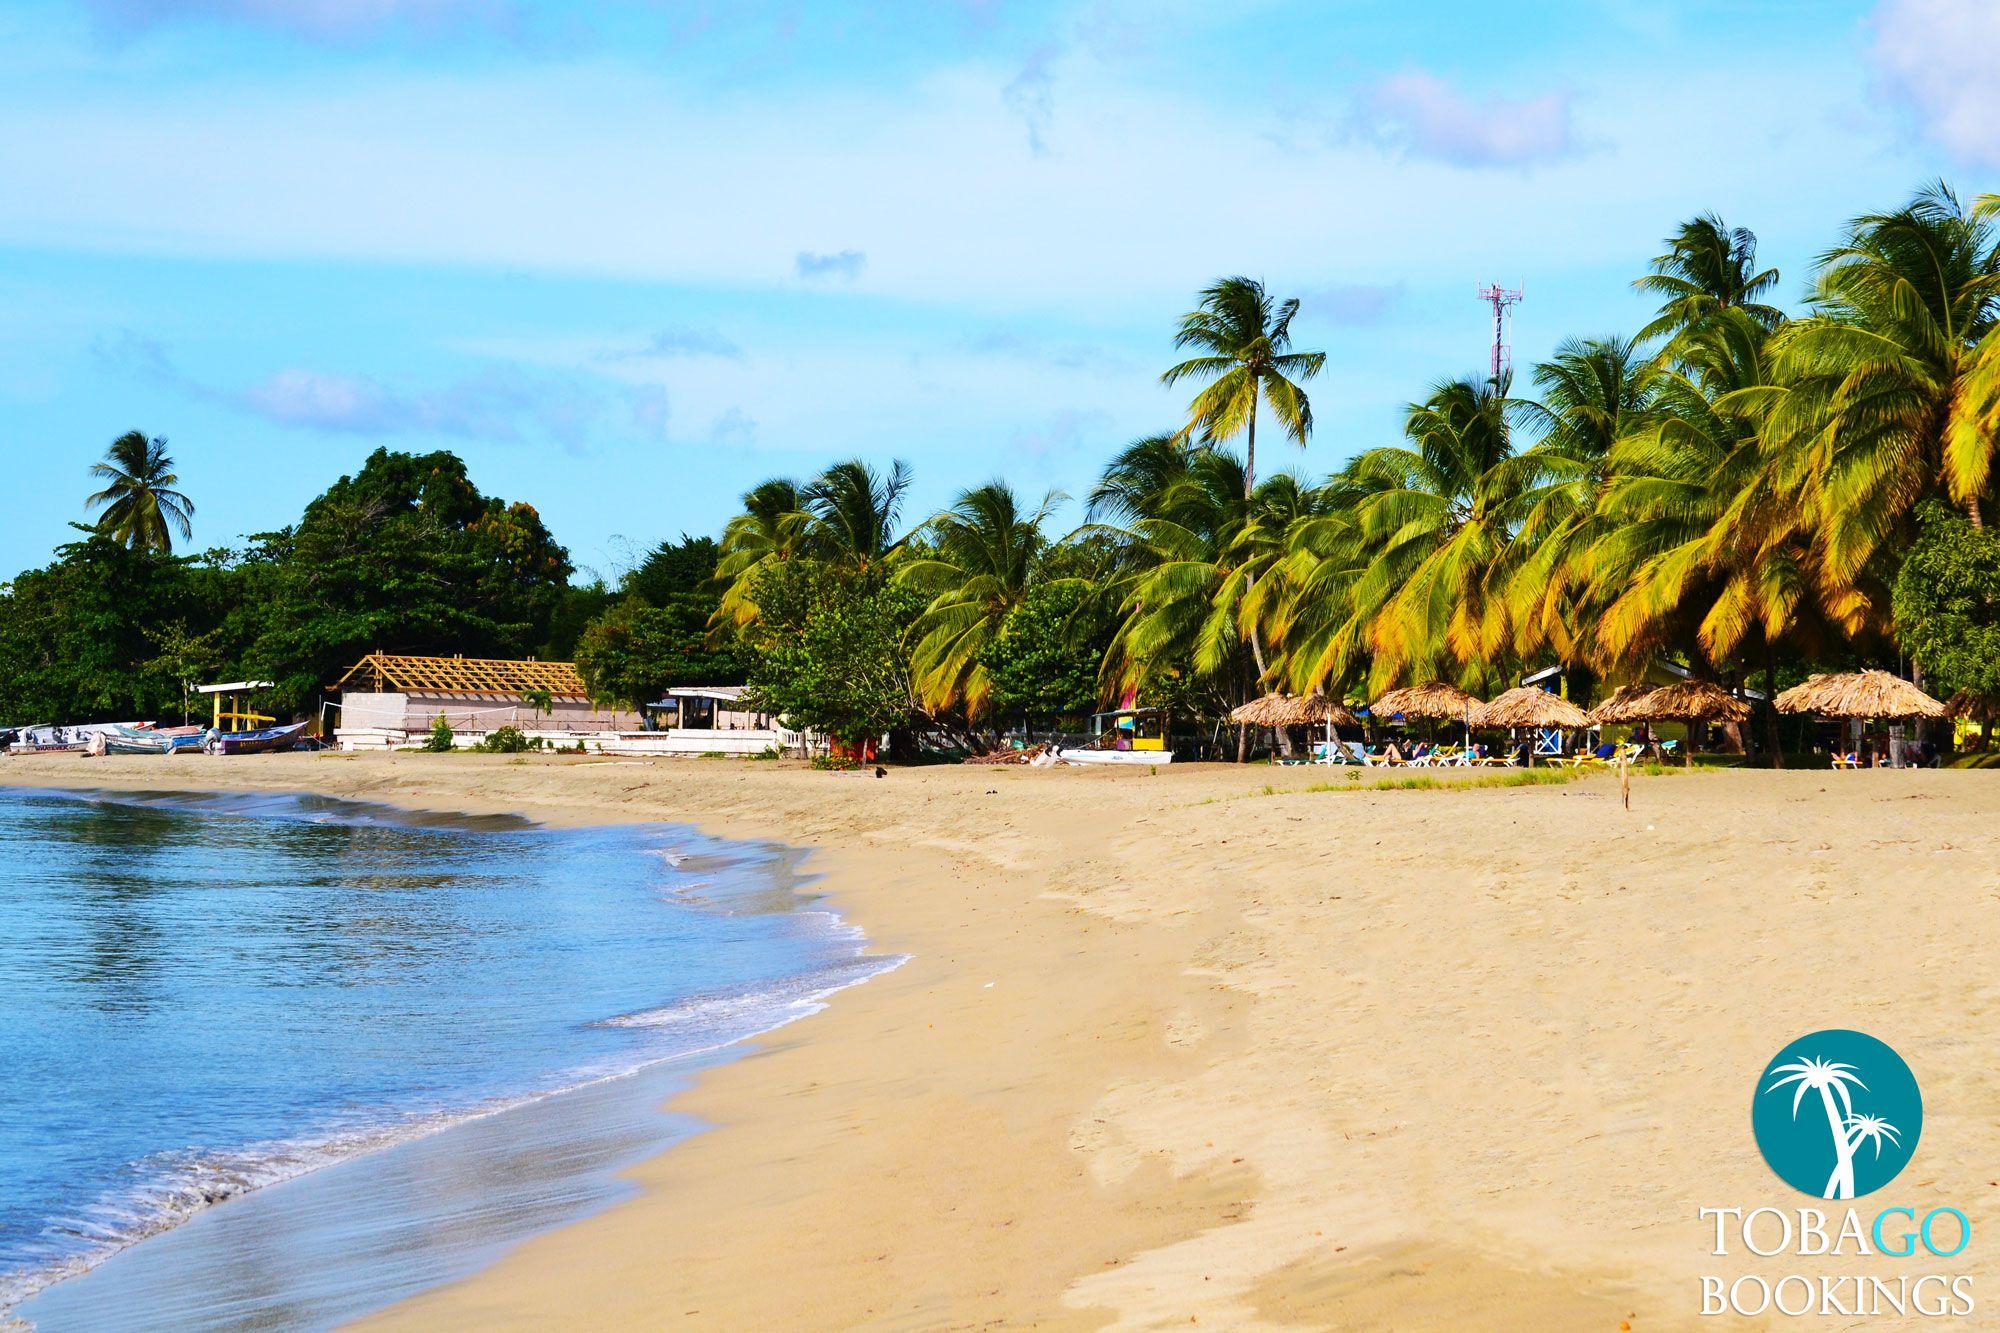 Turtle Beach Tobago Tobagobookings